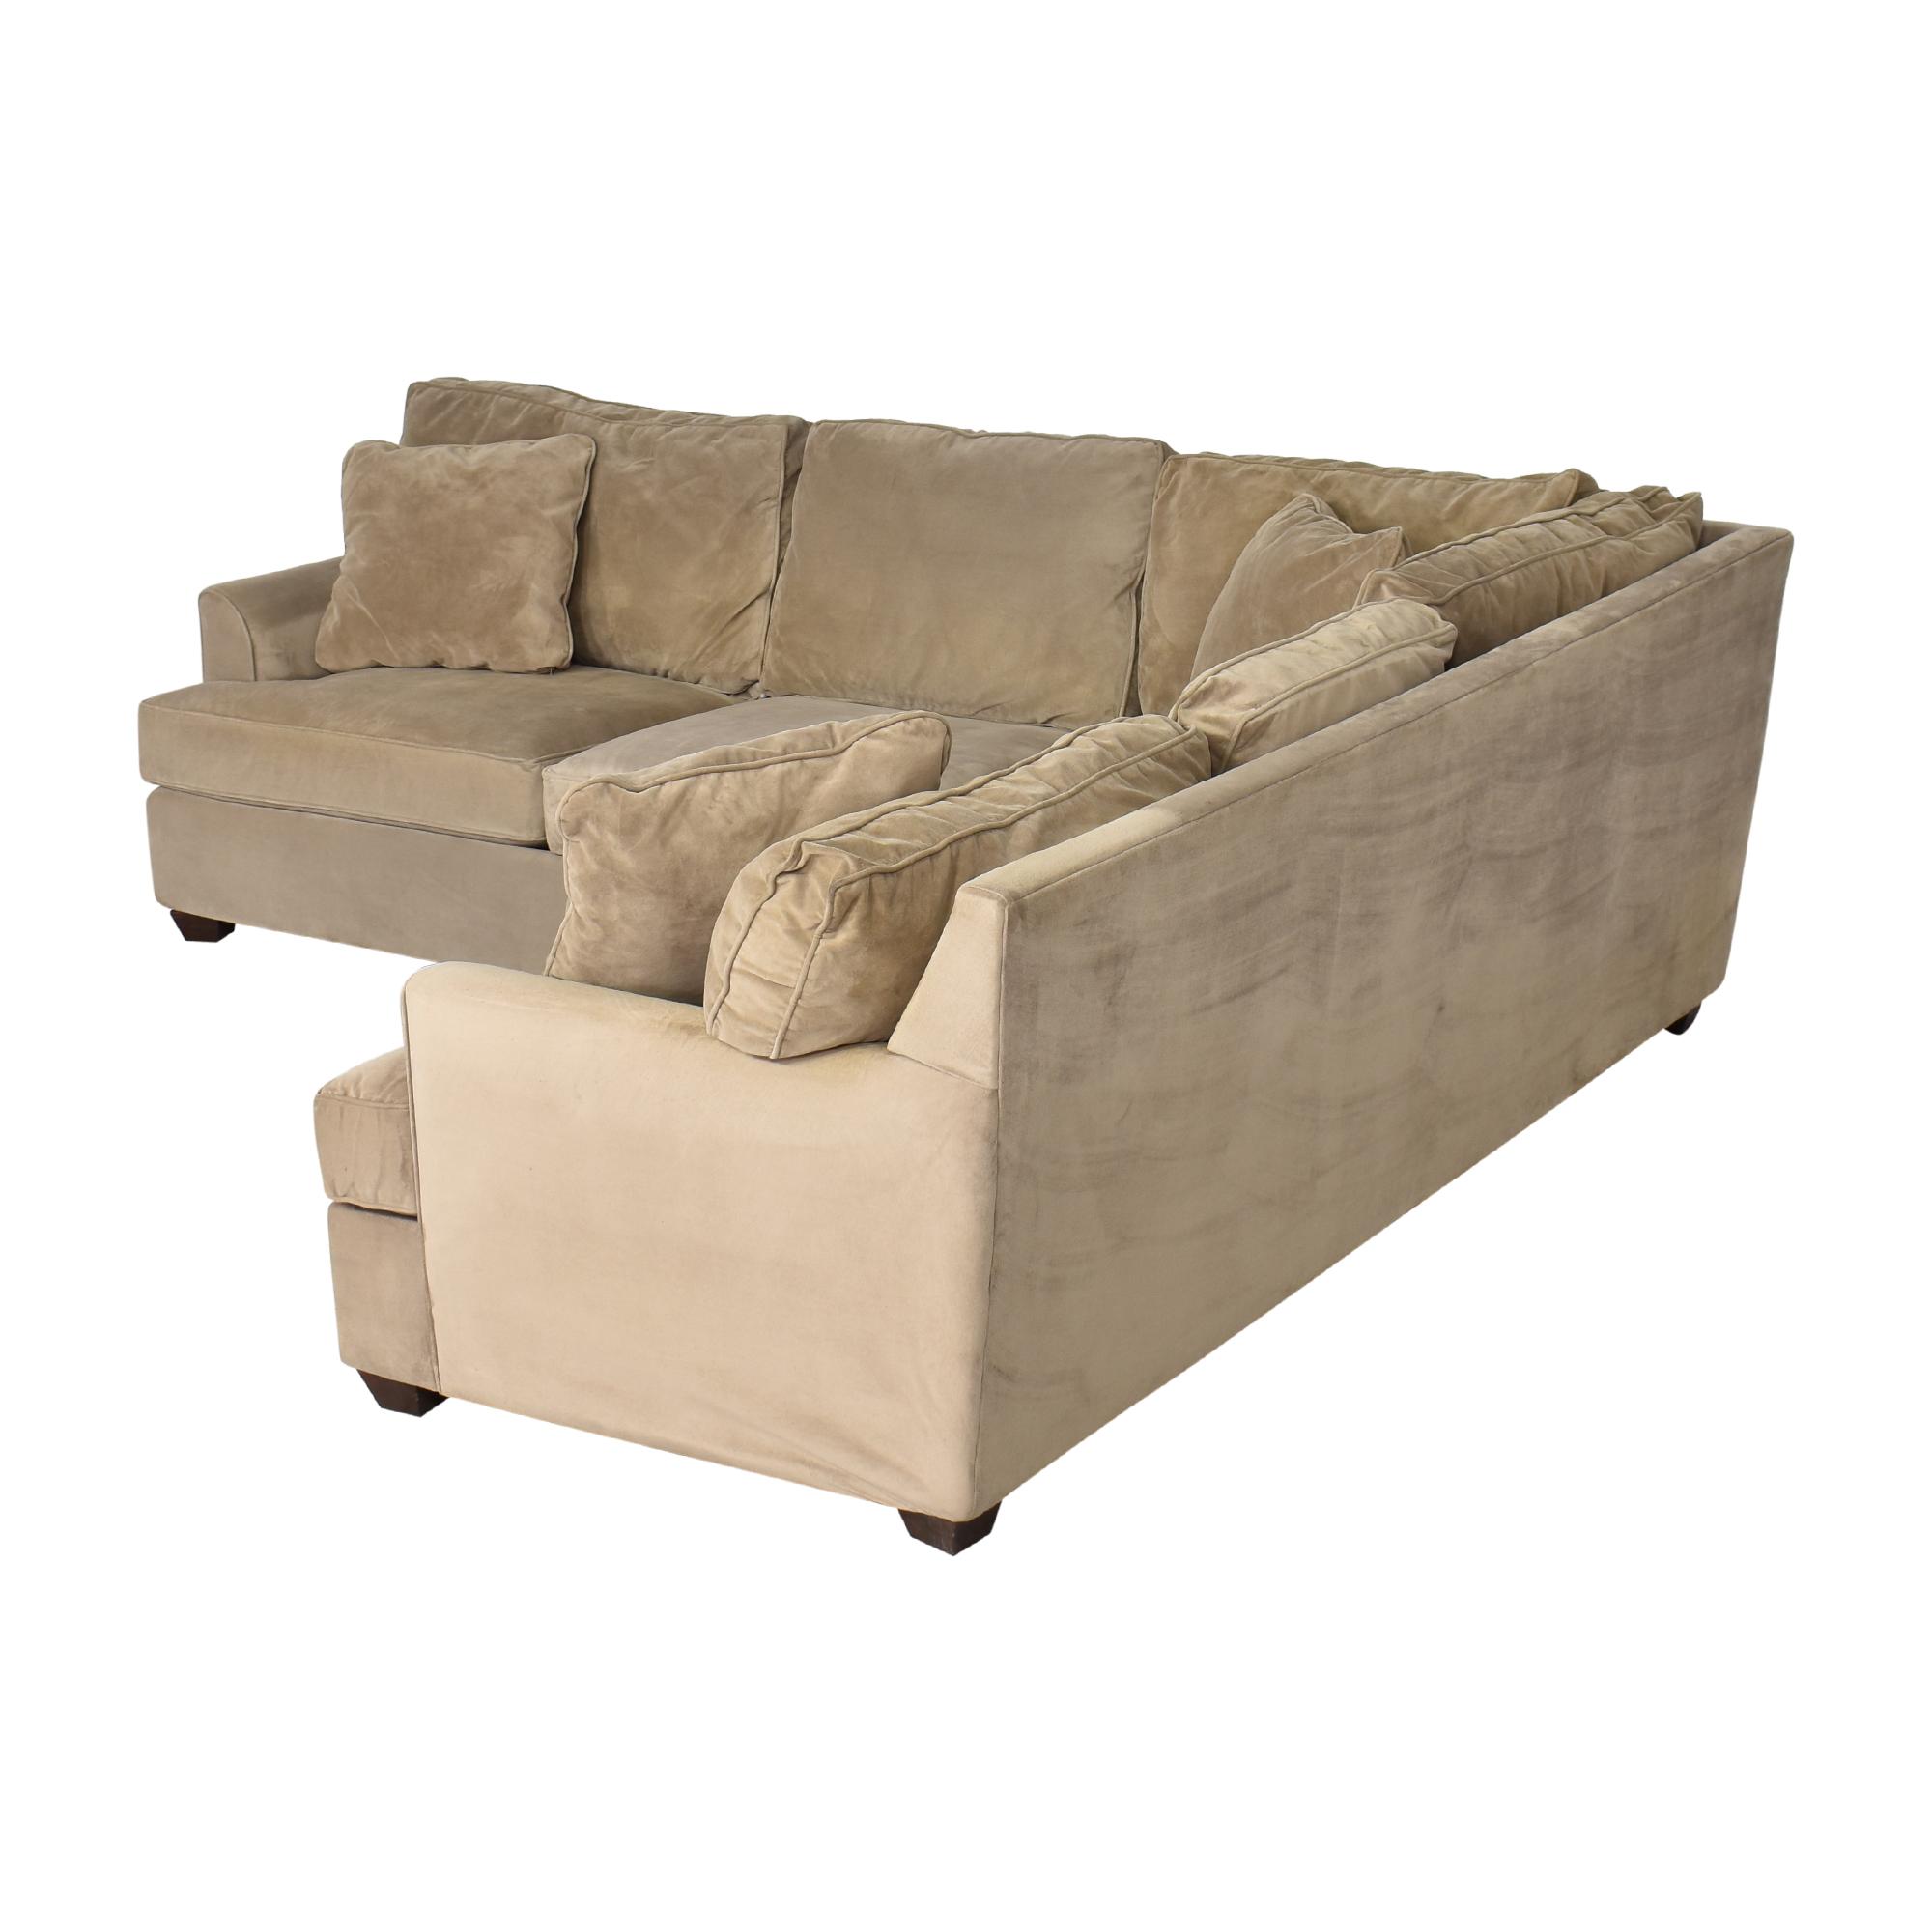 JC Penney JC Penney Corner Sectional Sofa ma